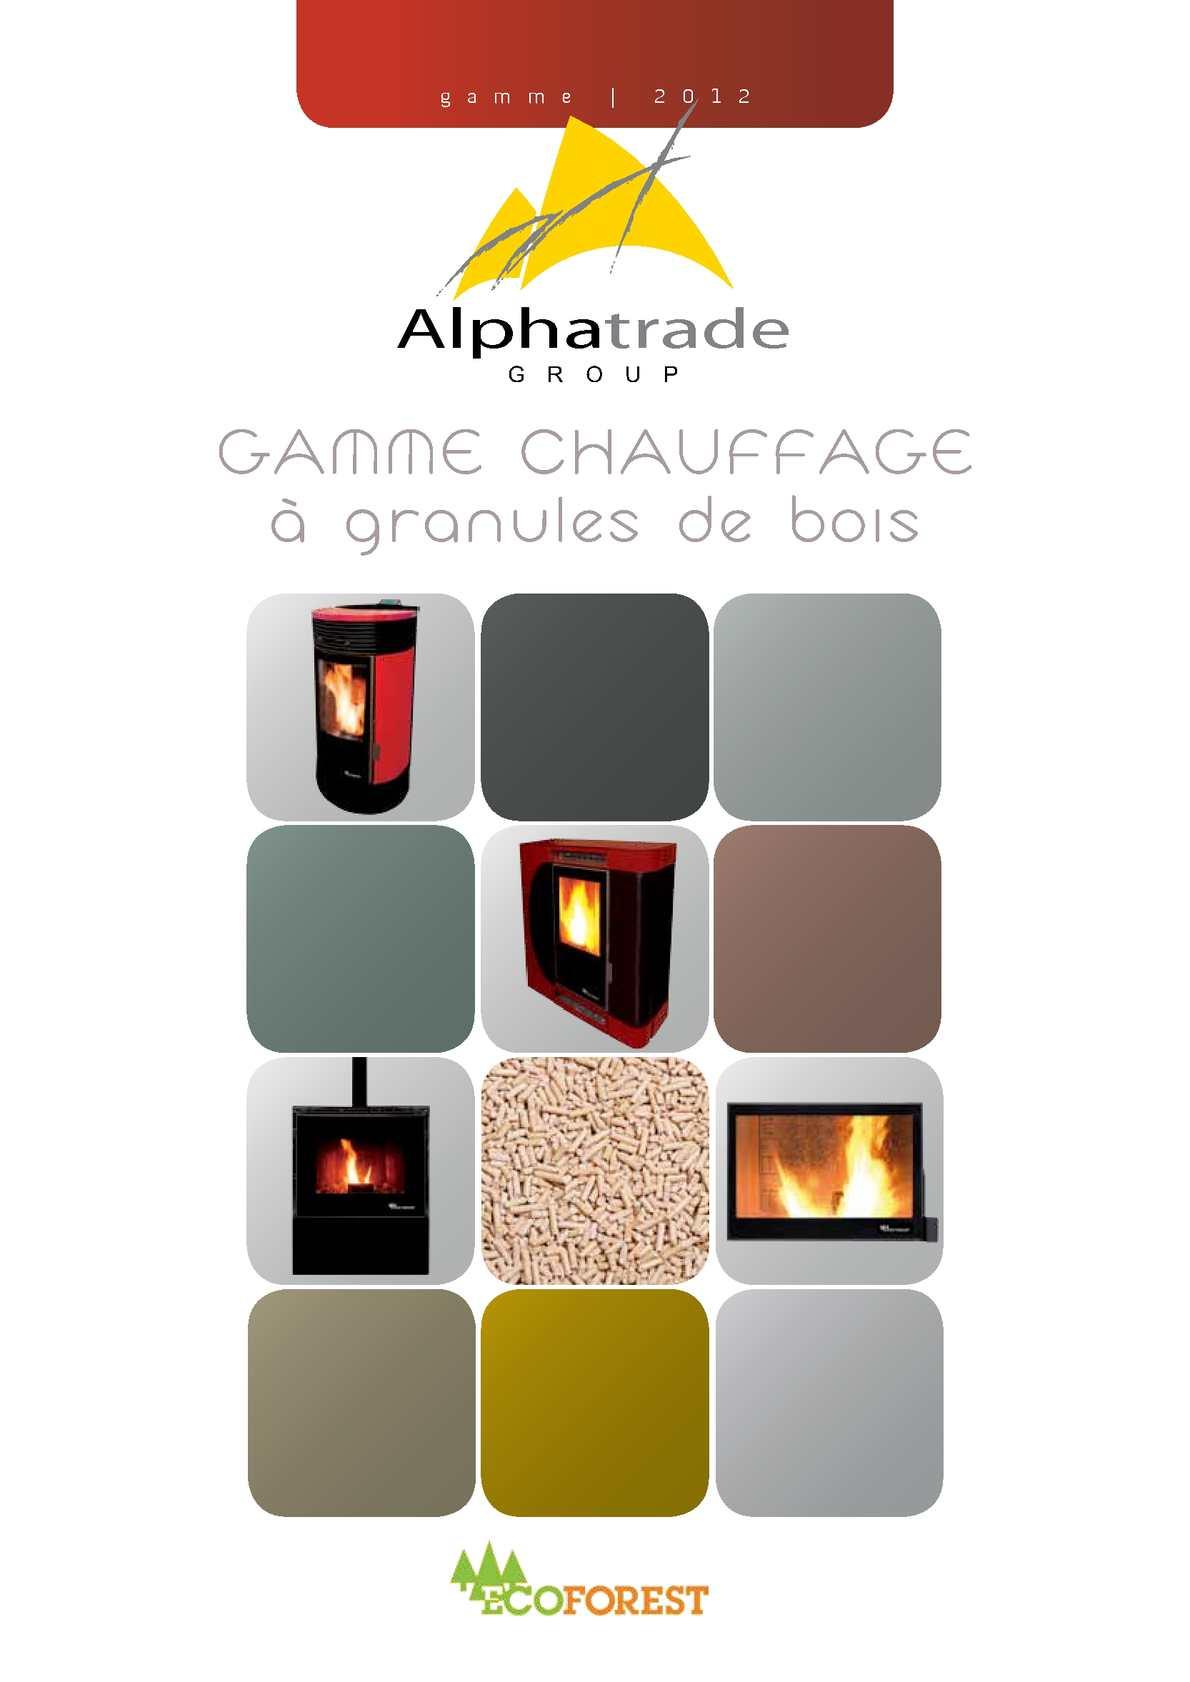 Calam o alphatrade group gamme chauffage granules de - Chauffage a granule ...